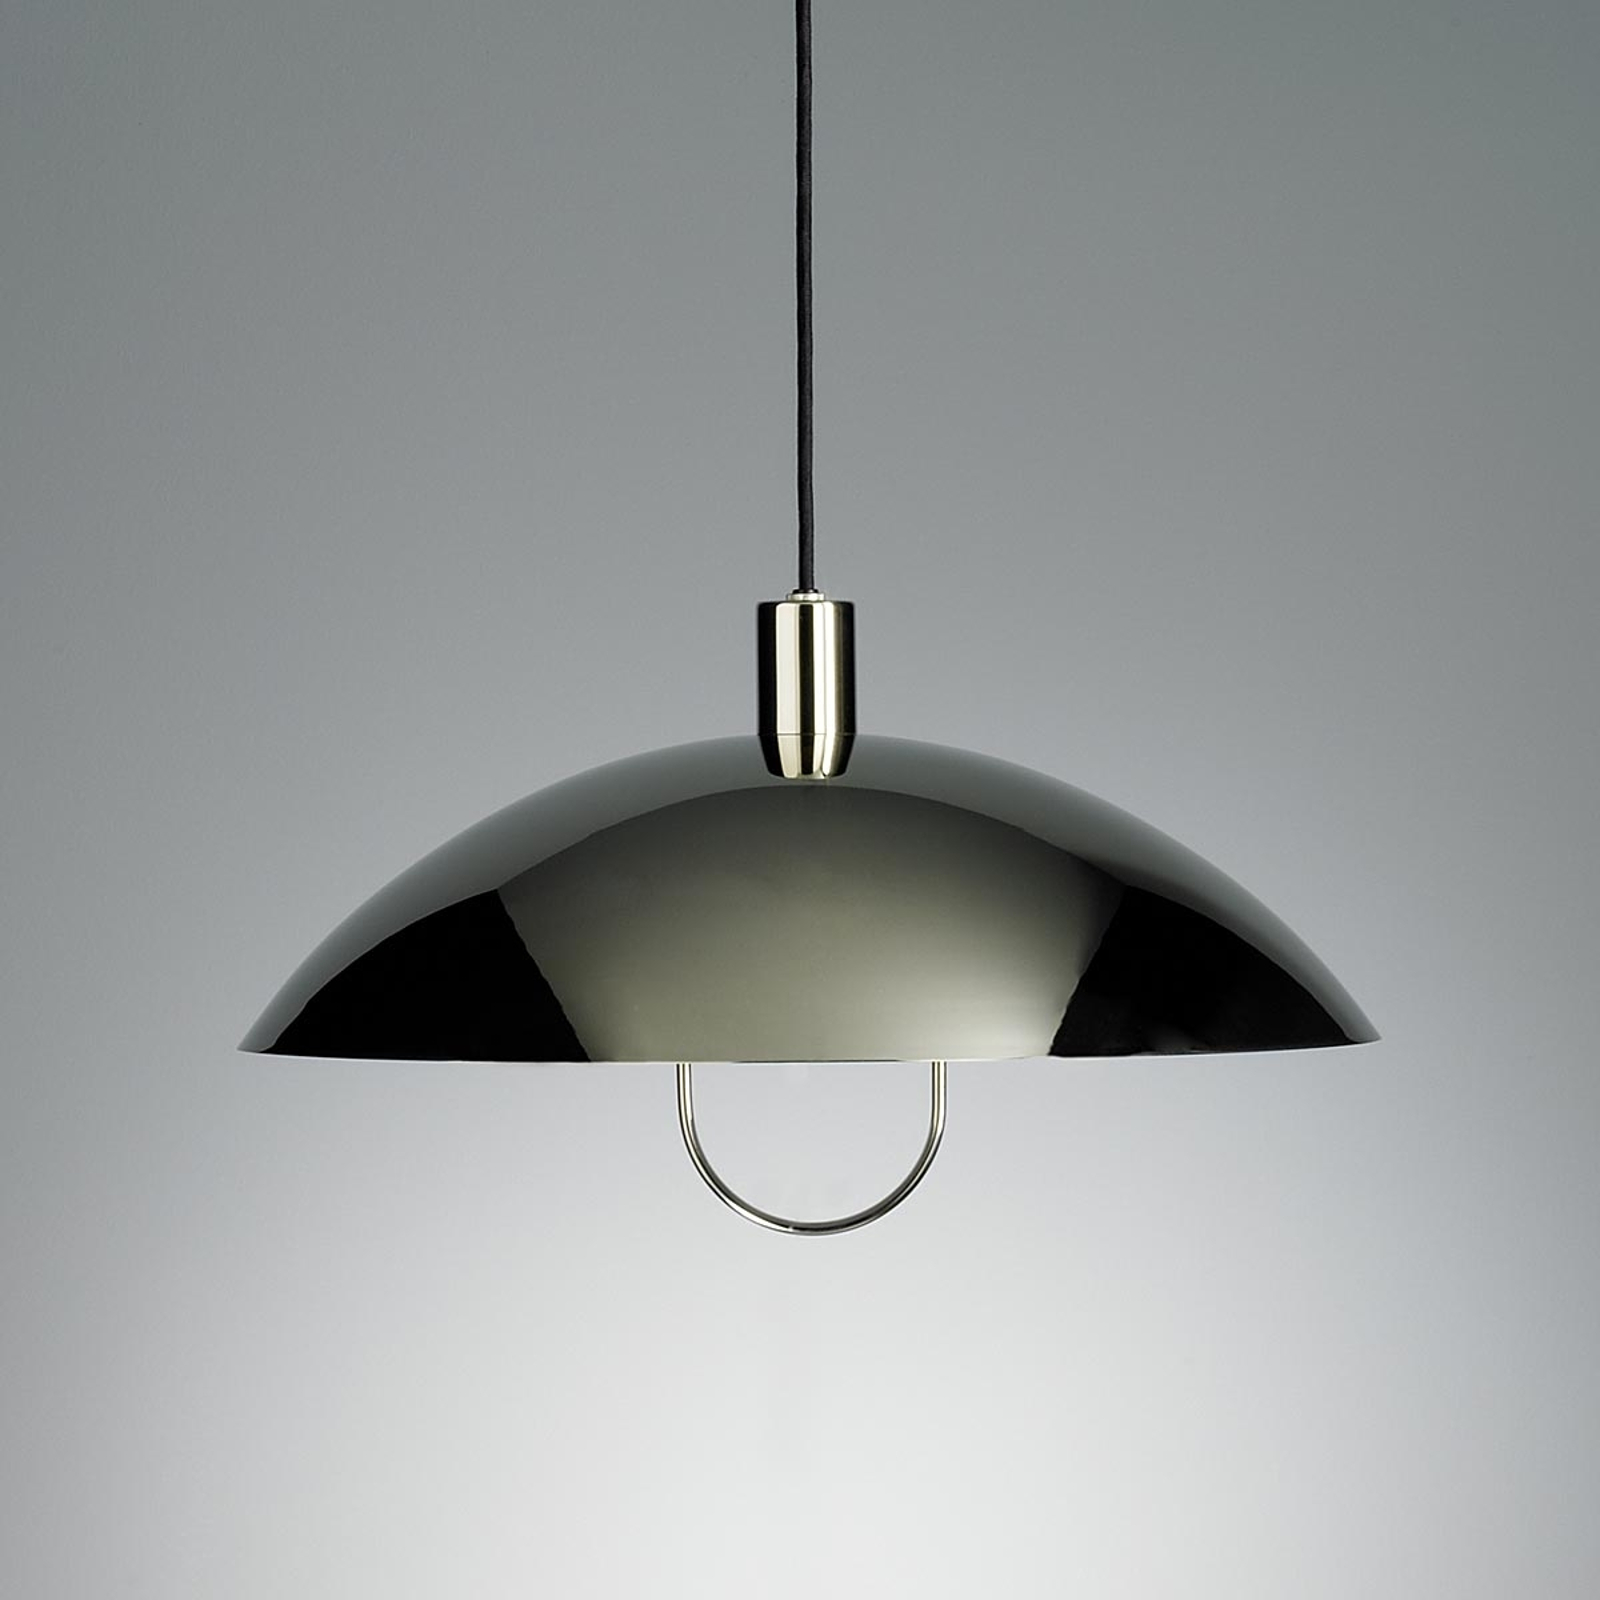 TECNOLUMEN HMB 25/500 hanglamp wit